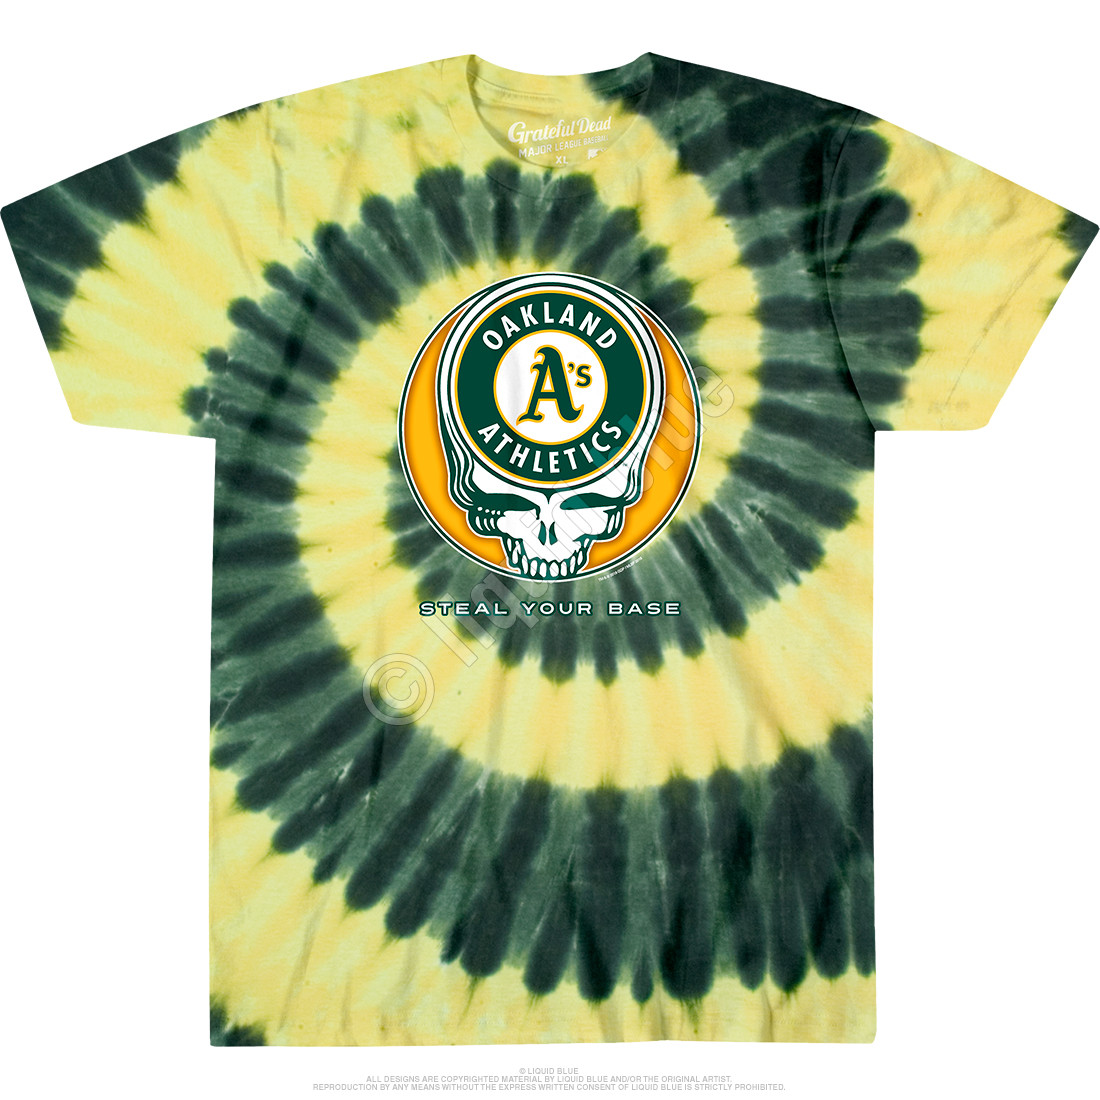 Oakland Athletics Steal Your Base Tie-Dye Tie-Dye T-Shirt